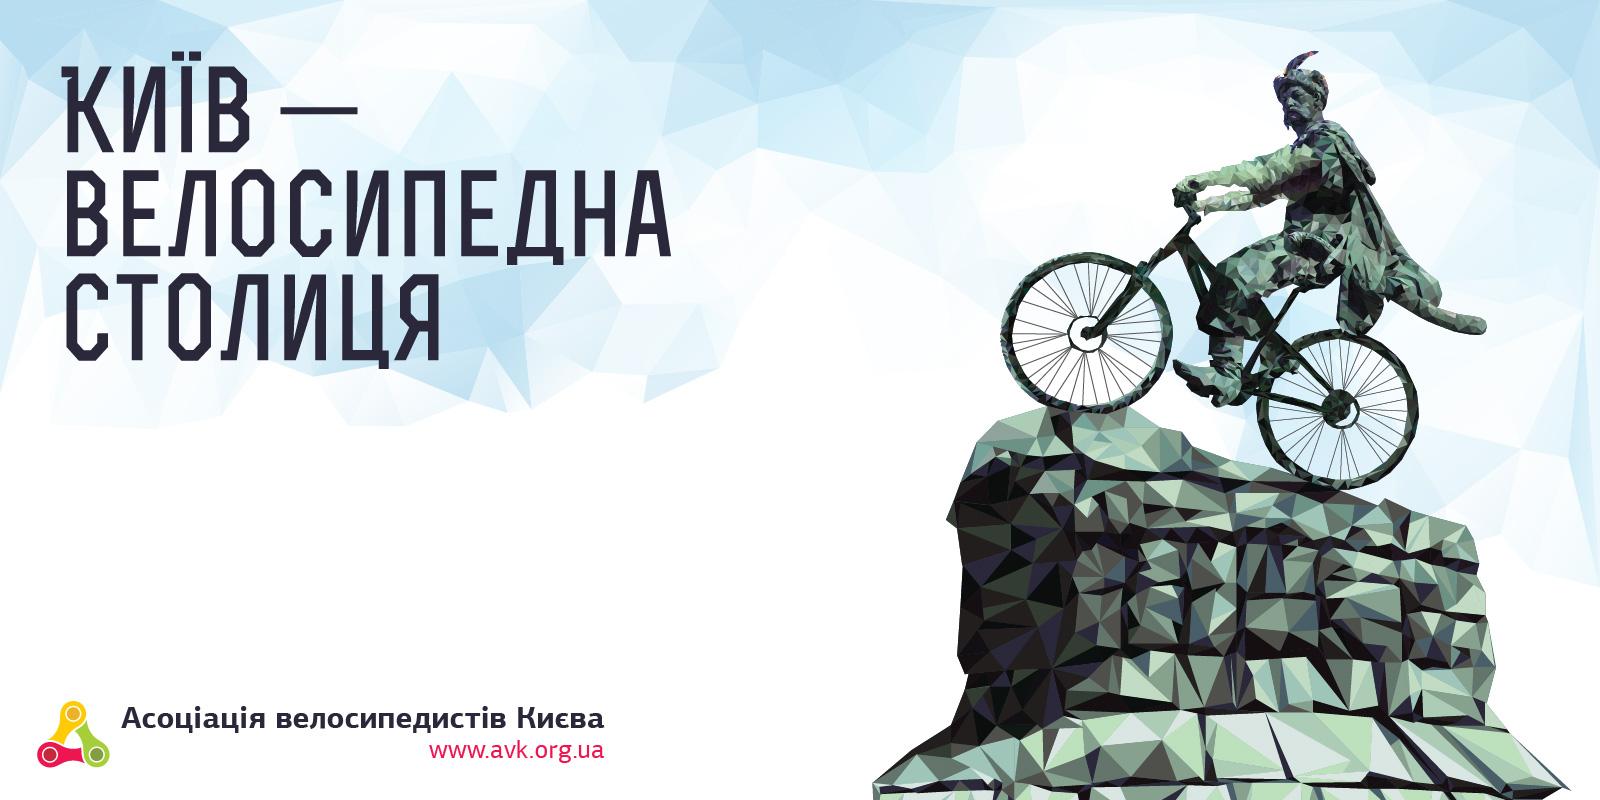 http://socialadvertising.com.ua/upload/iblock/9f1/9f19b4758e945dd80320558dcae70e4e.jpg